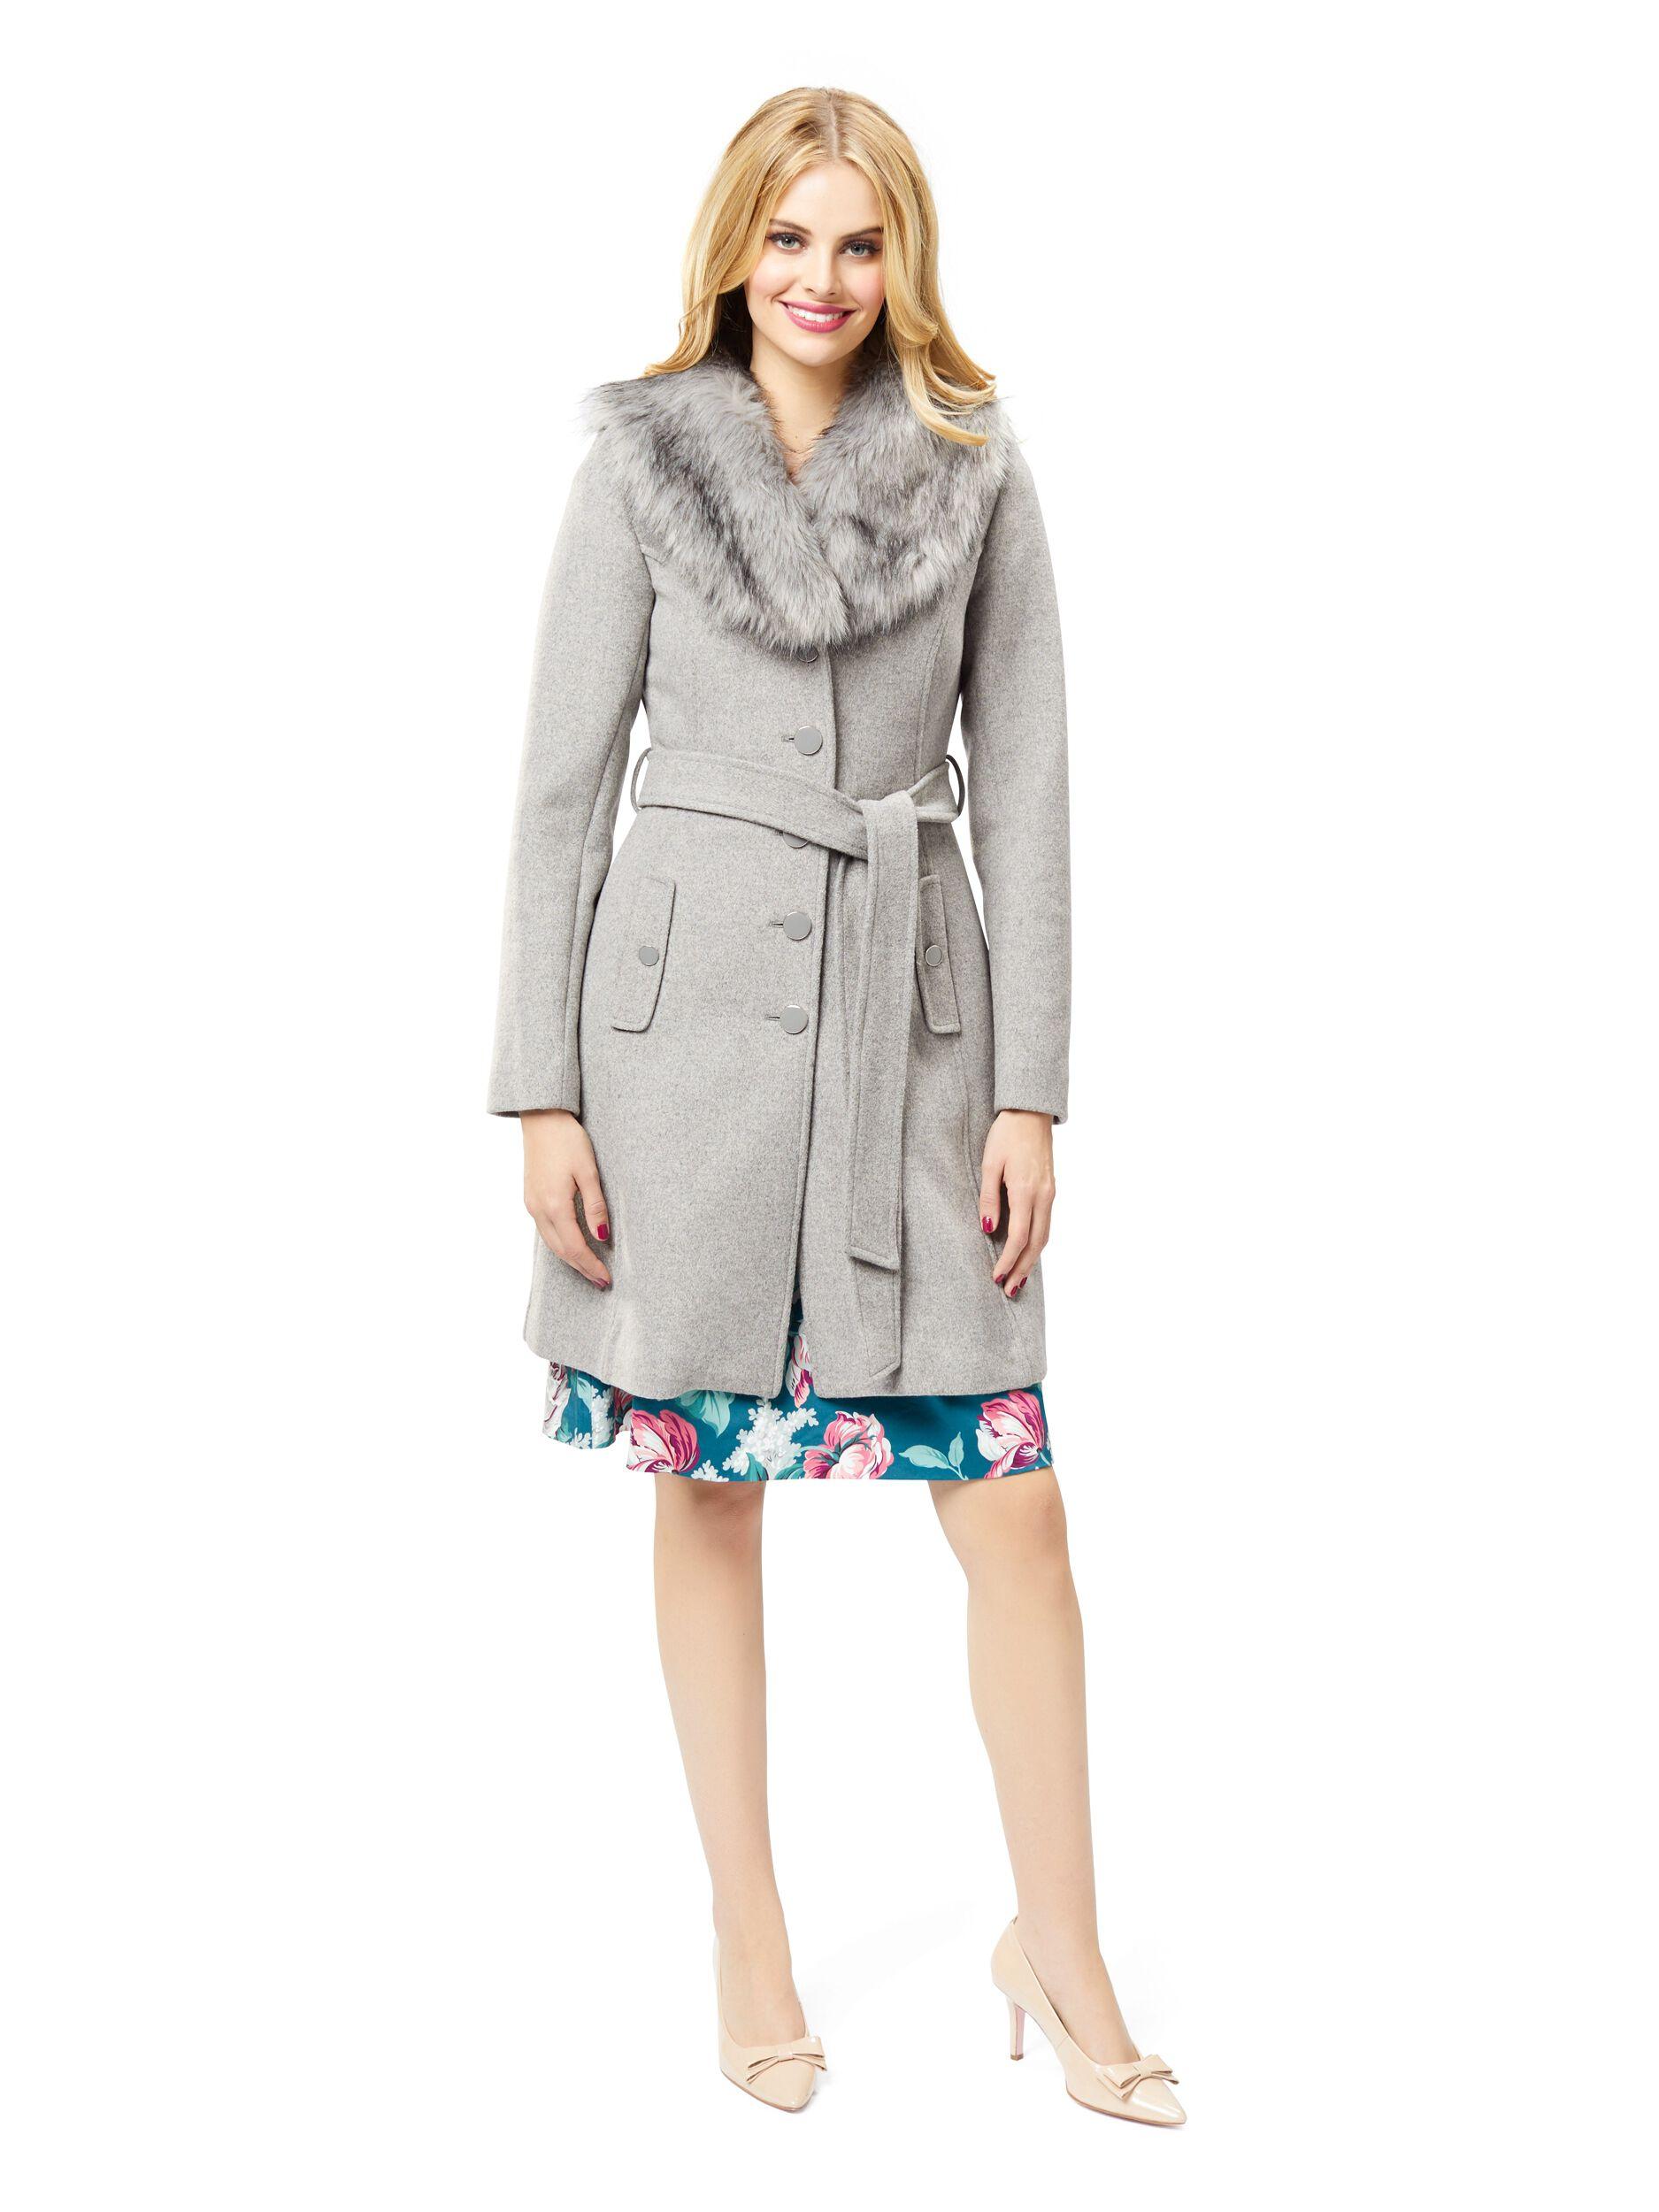 Tawny Coat